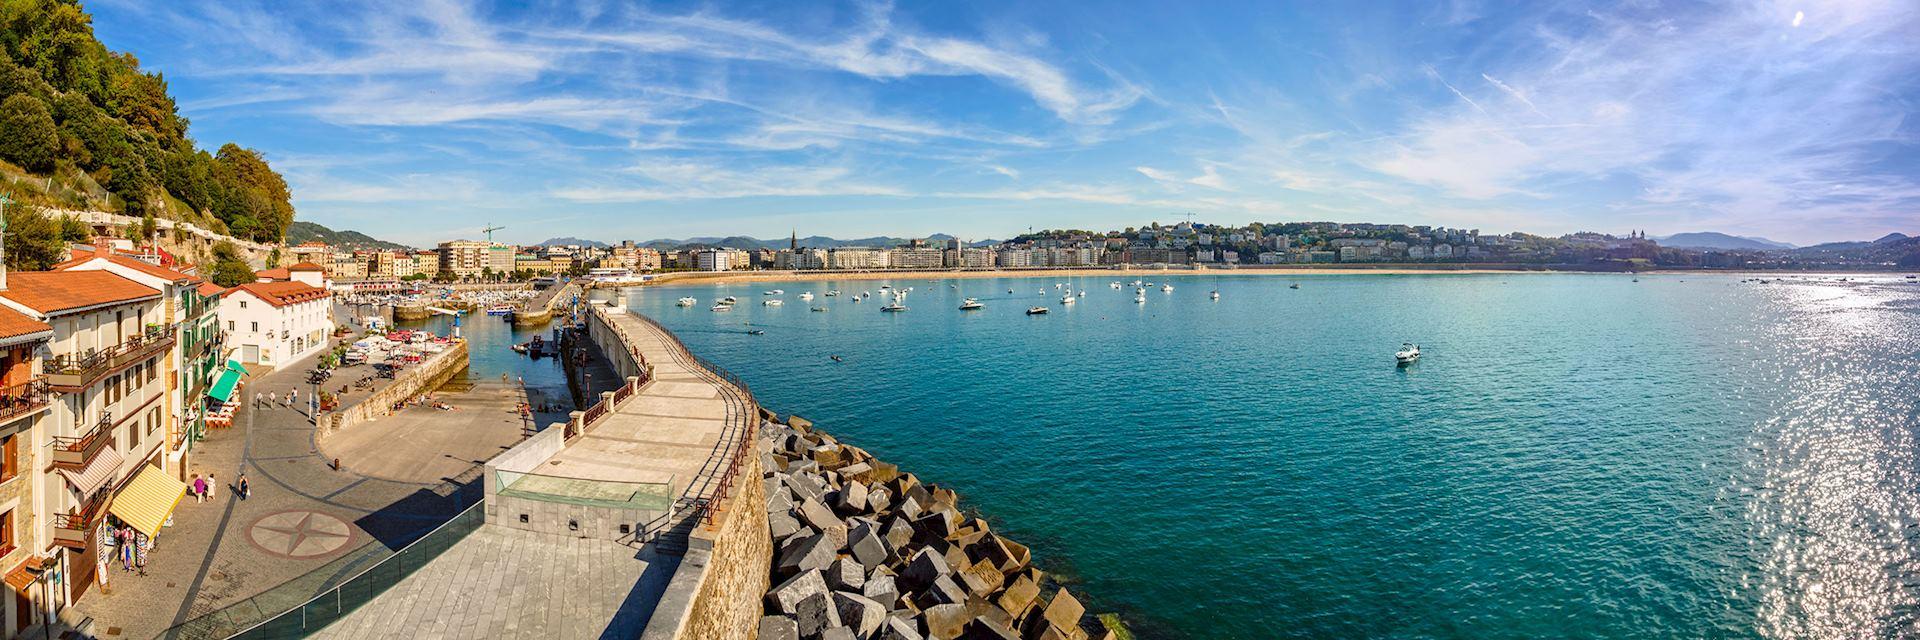 Panoramic view of La Concha Bay, San Sebastian, Donostia, Basque Country, Spain